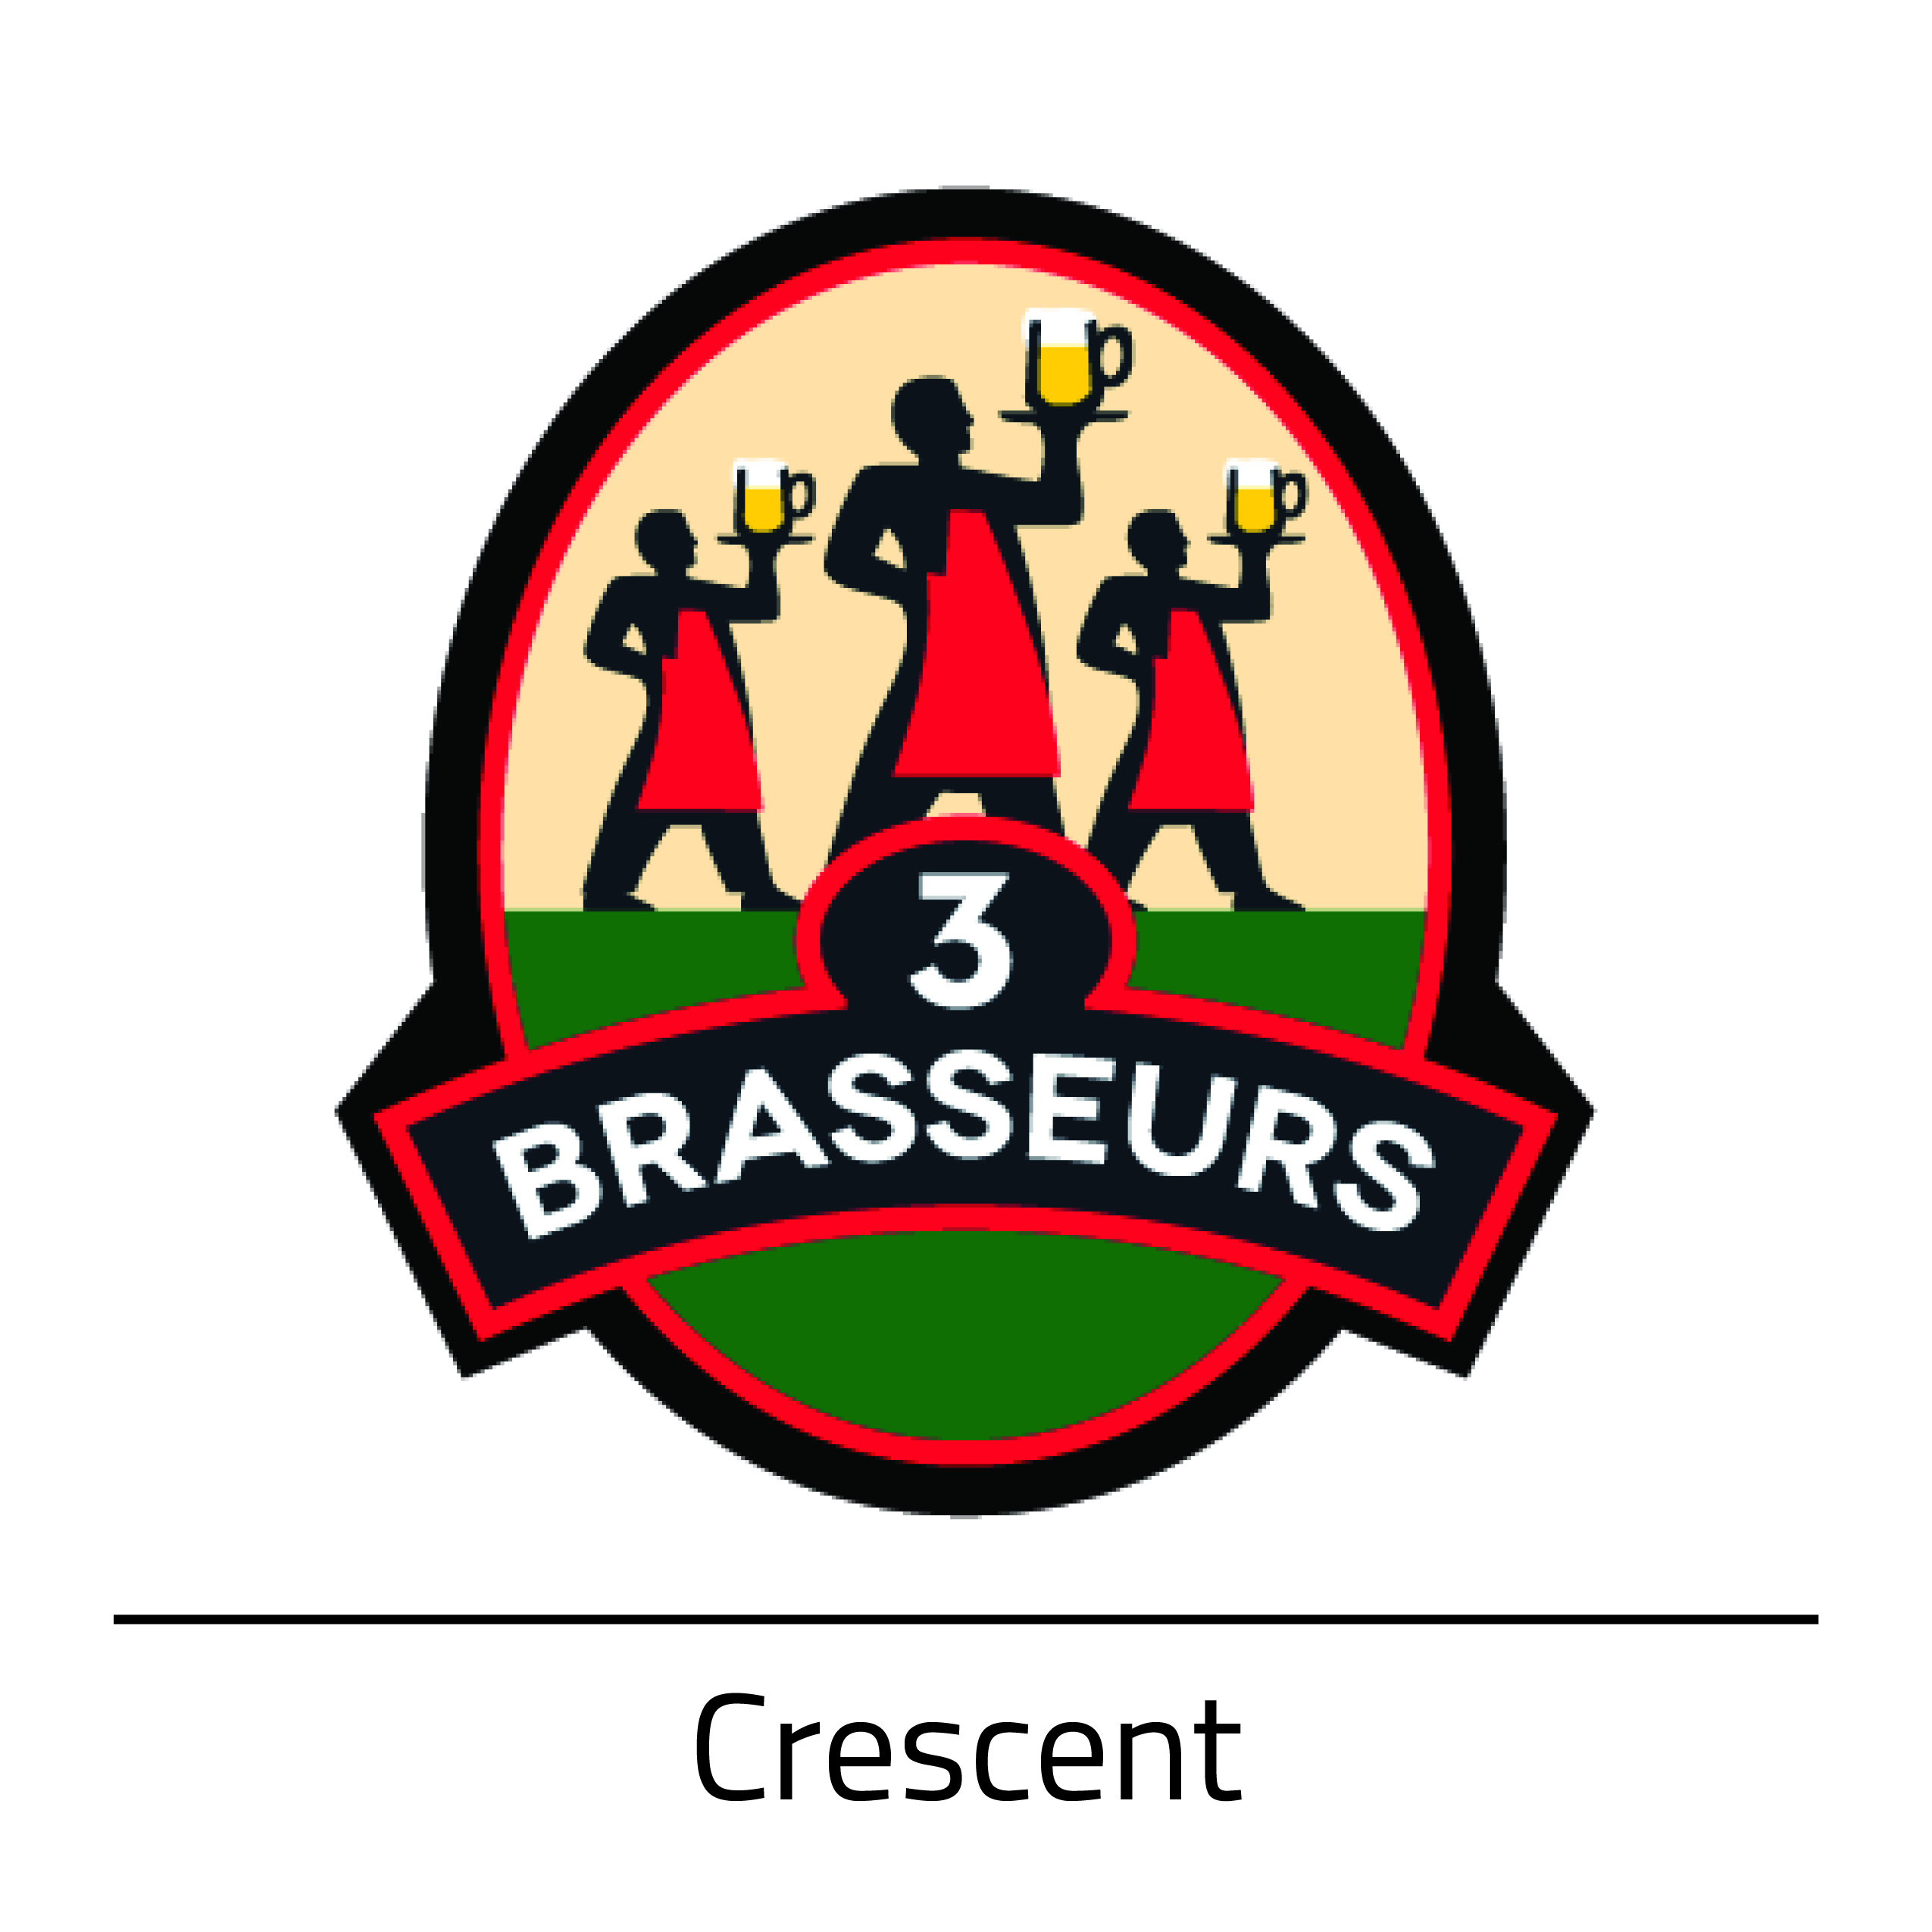 3 Brasseurs Crescent